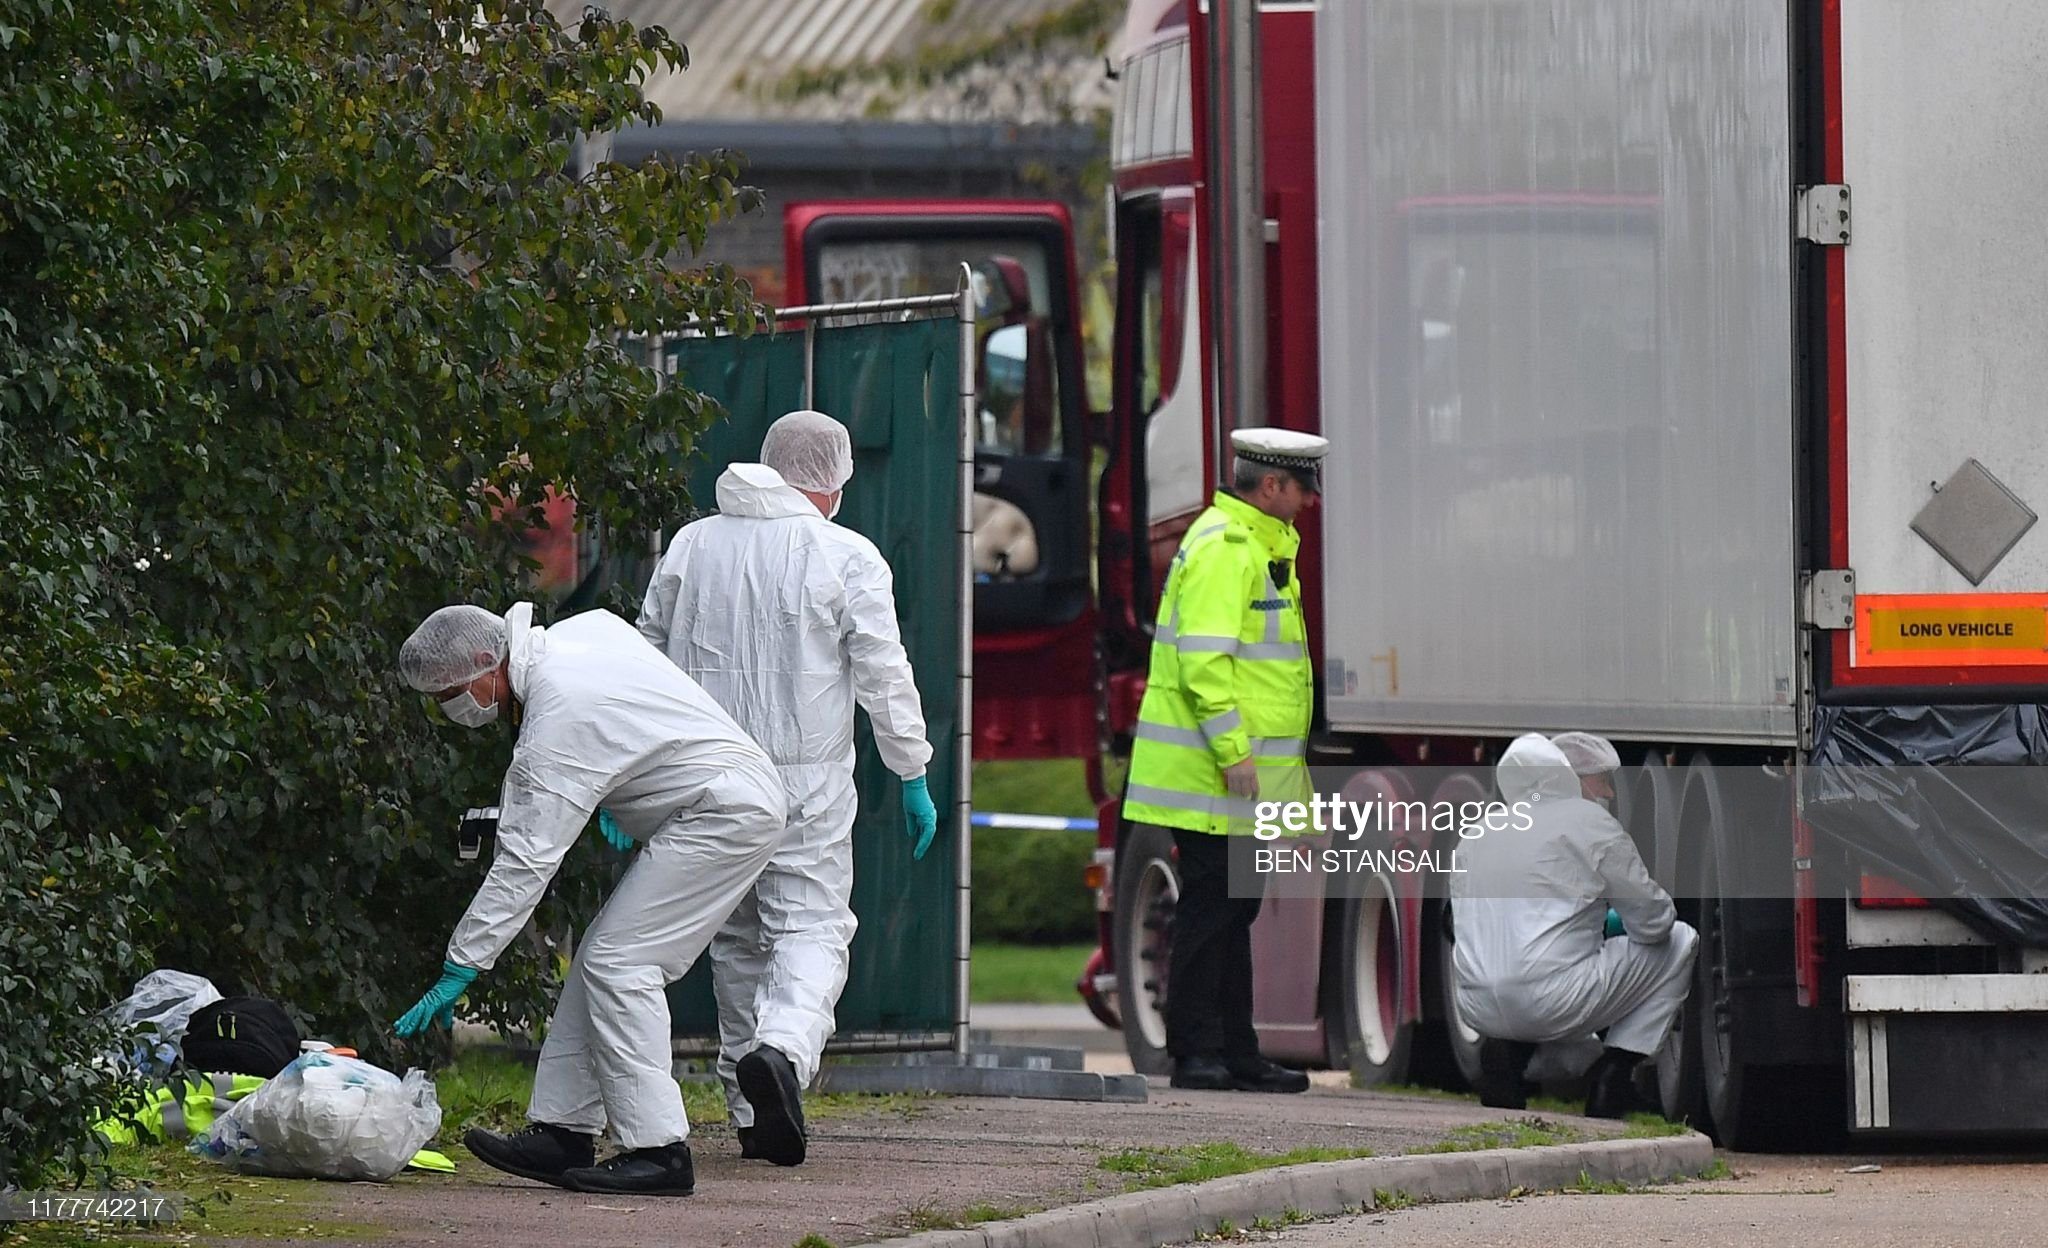 BRITAIN-BULGARIA-POLICE : News Photo